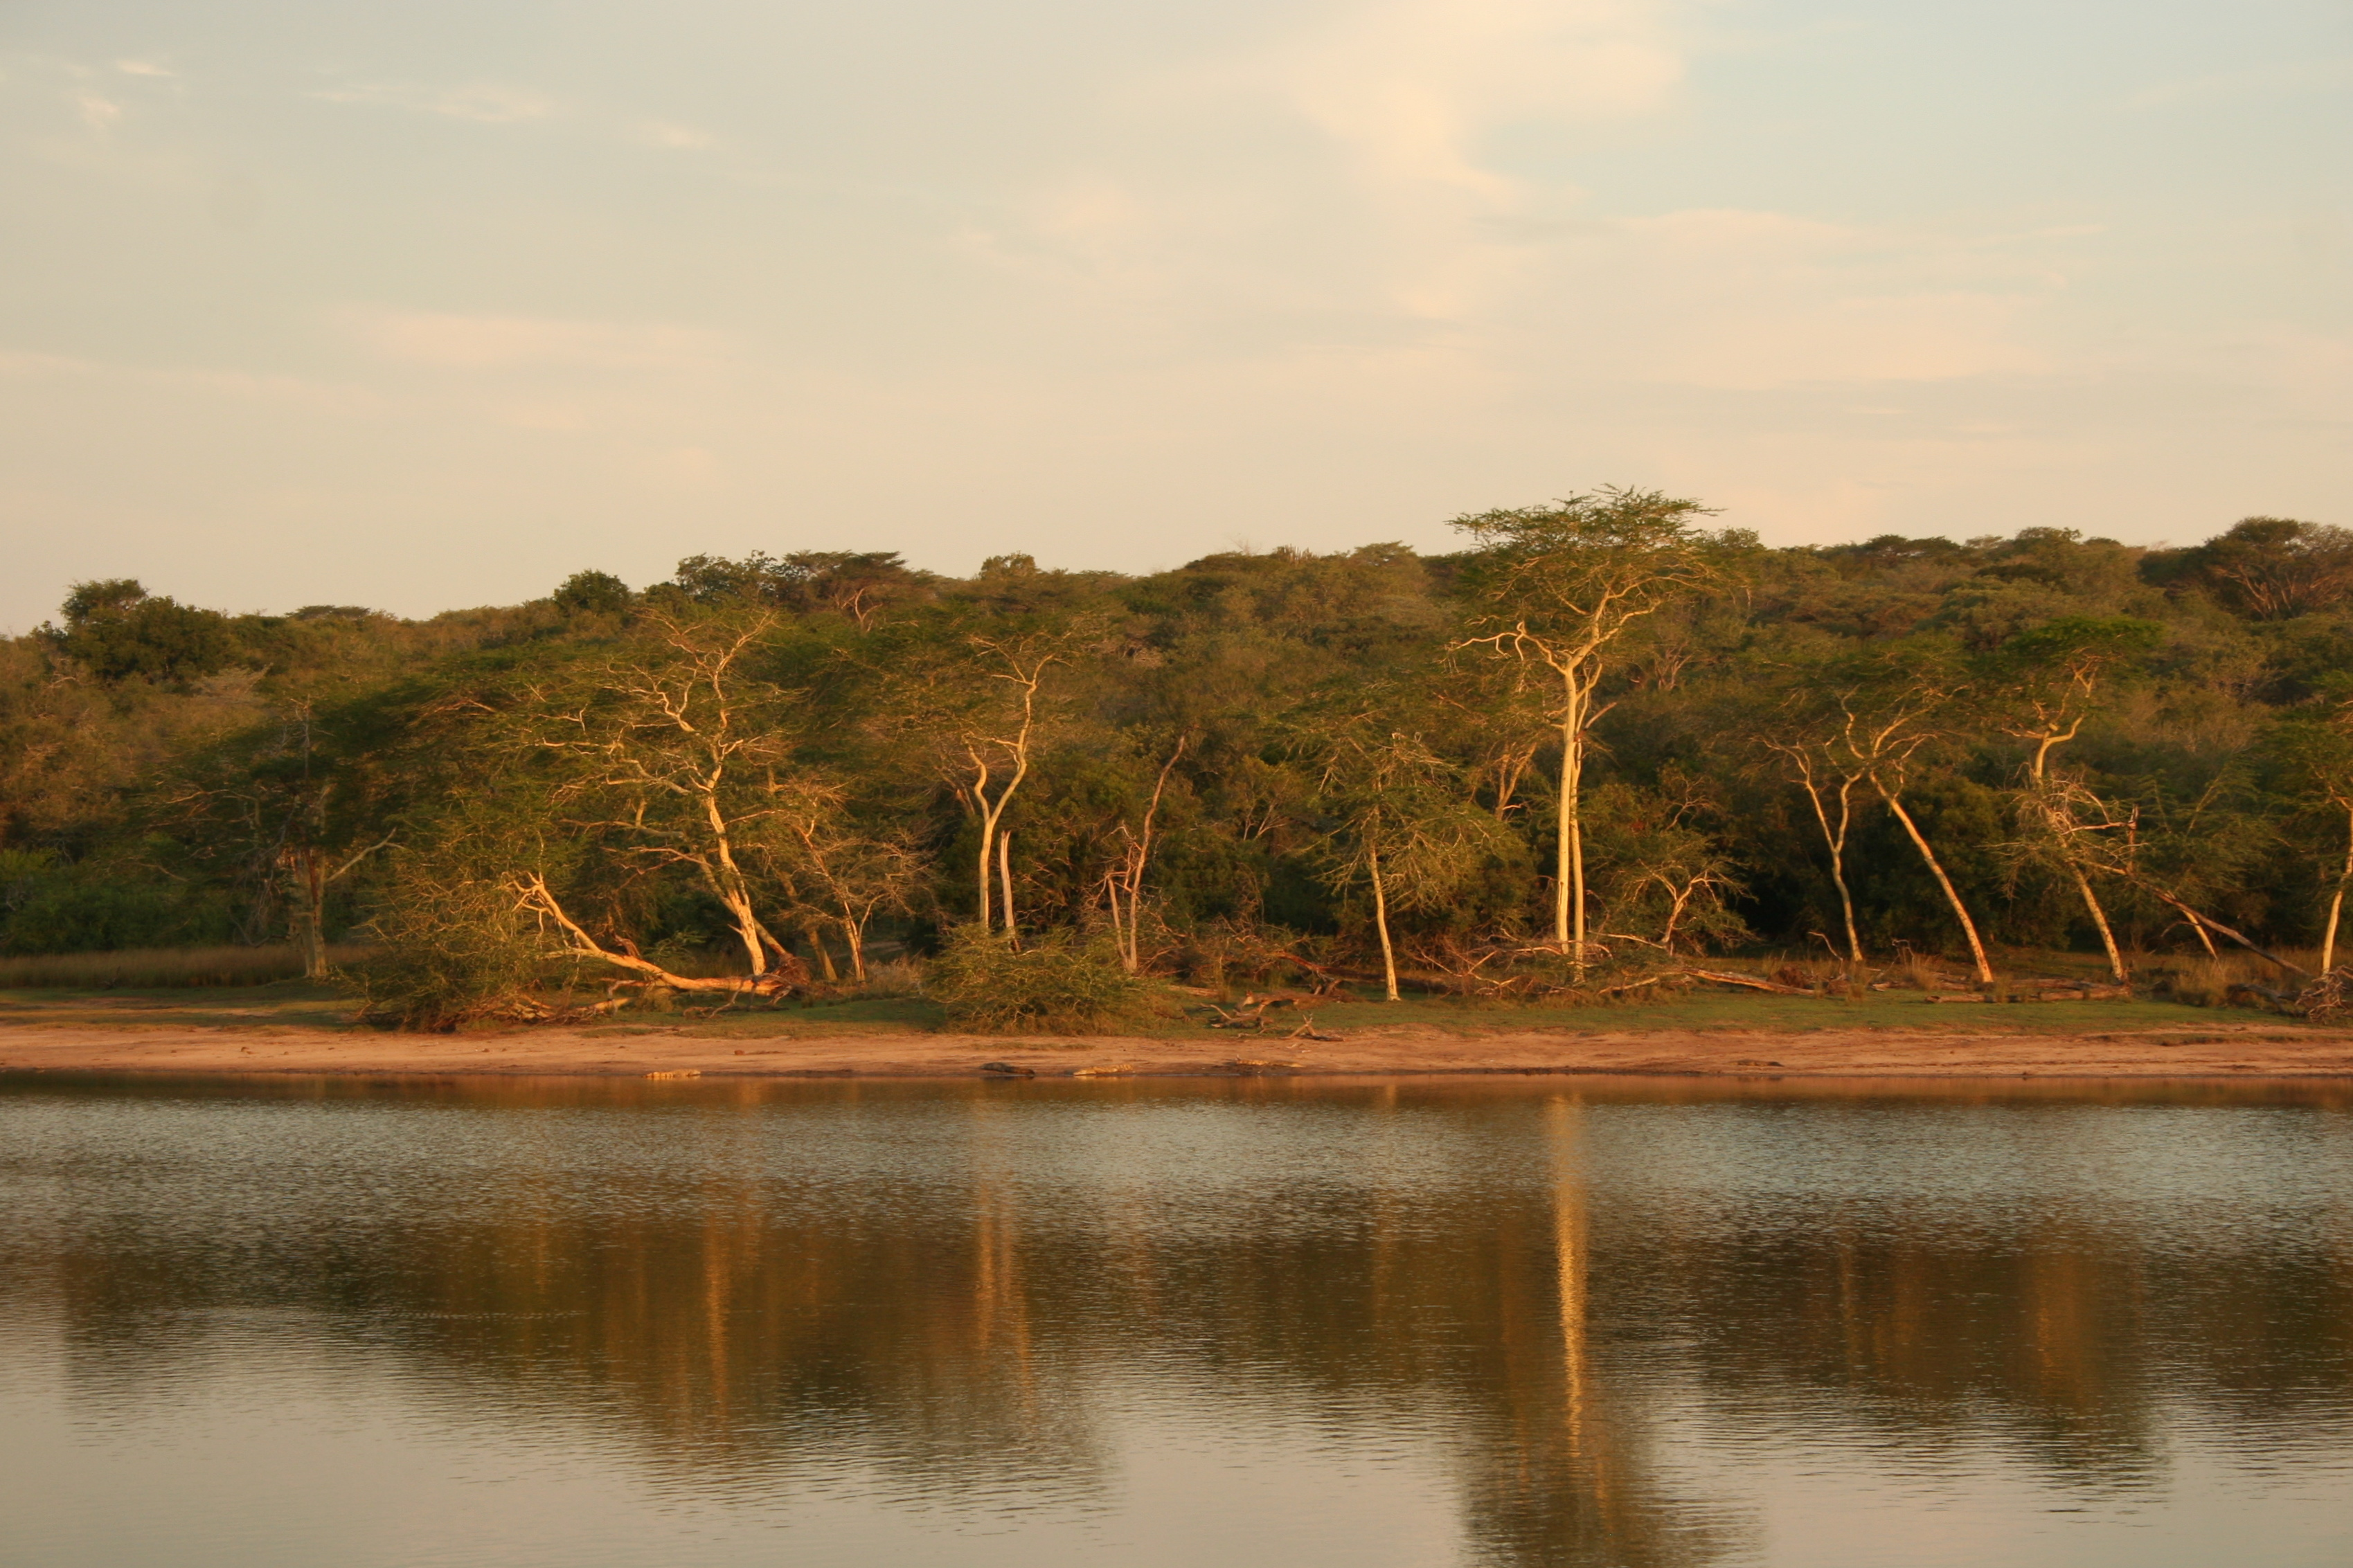 Suedafrika Kleingruppenreise - Flusslandschaft - Hluhluwe - Imfolzi Game Reserve - Suedafrika